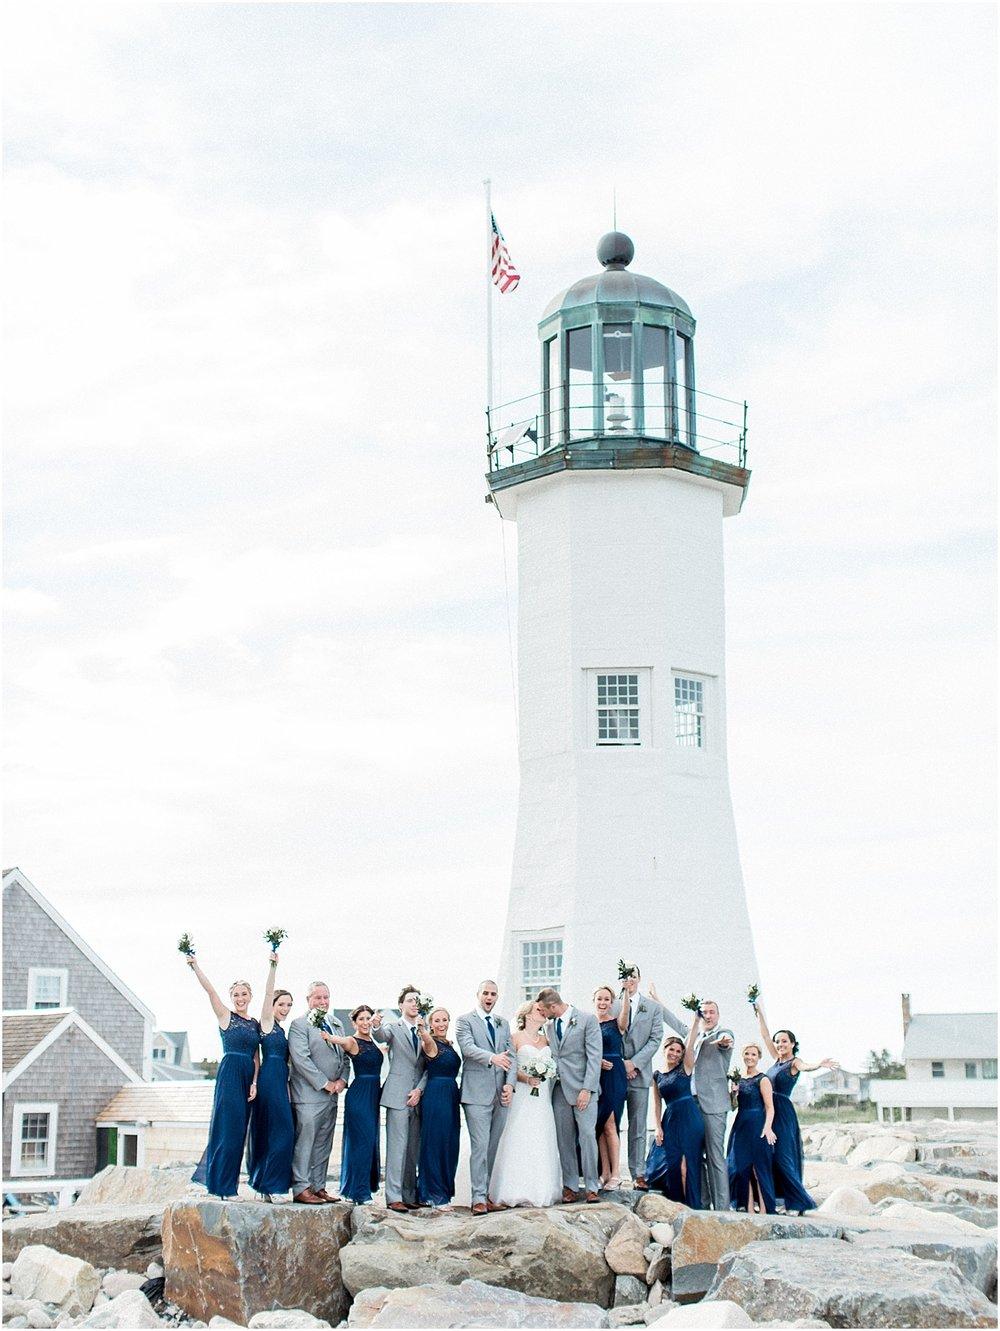 samantha_anthony_sam_old_scituate_light_barker_tavern_south_shore_cape_cod_boston_wedding_photographer_meredith_jane_photography_photo_0286.jpg